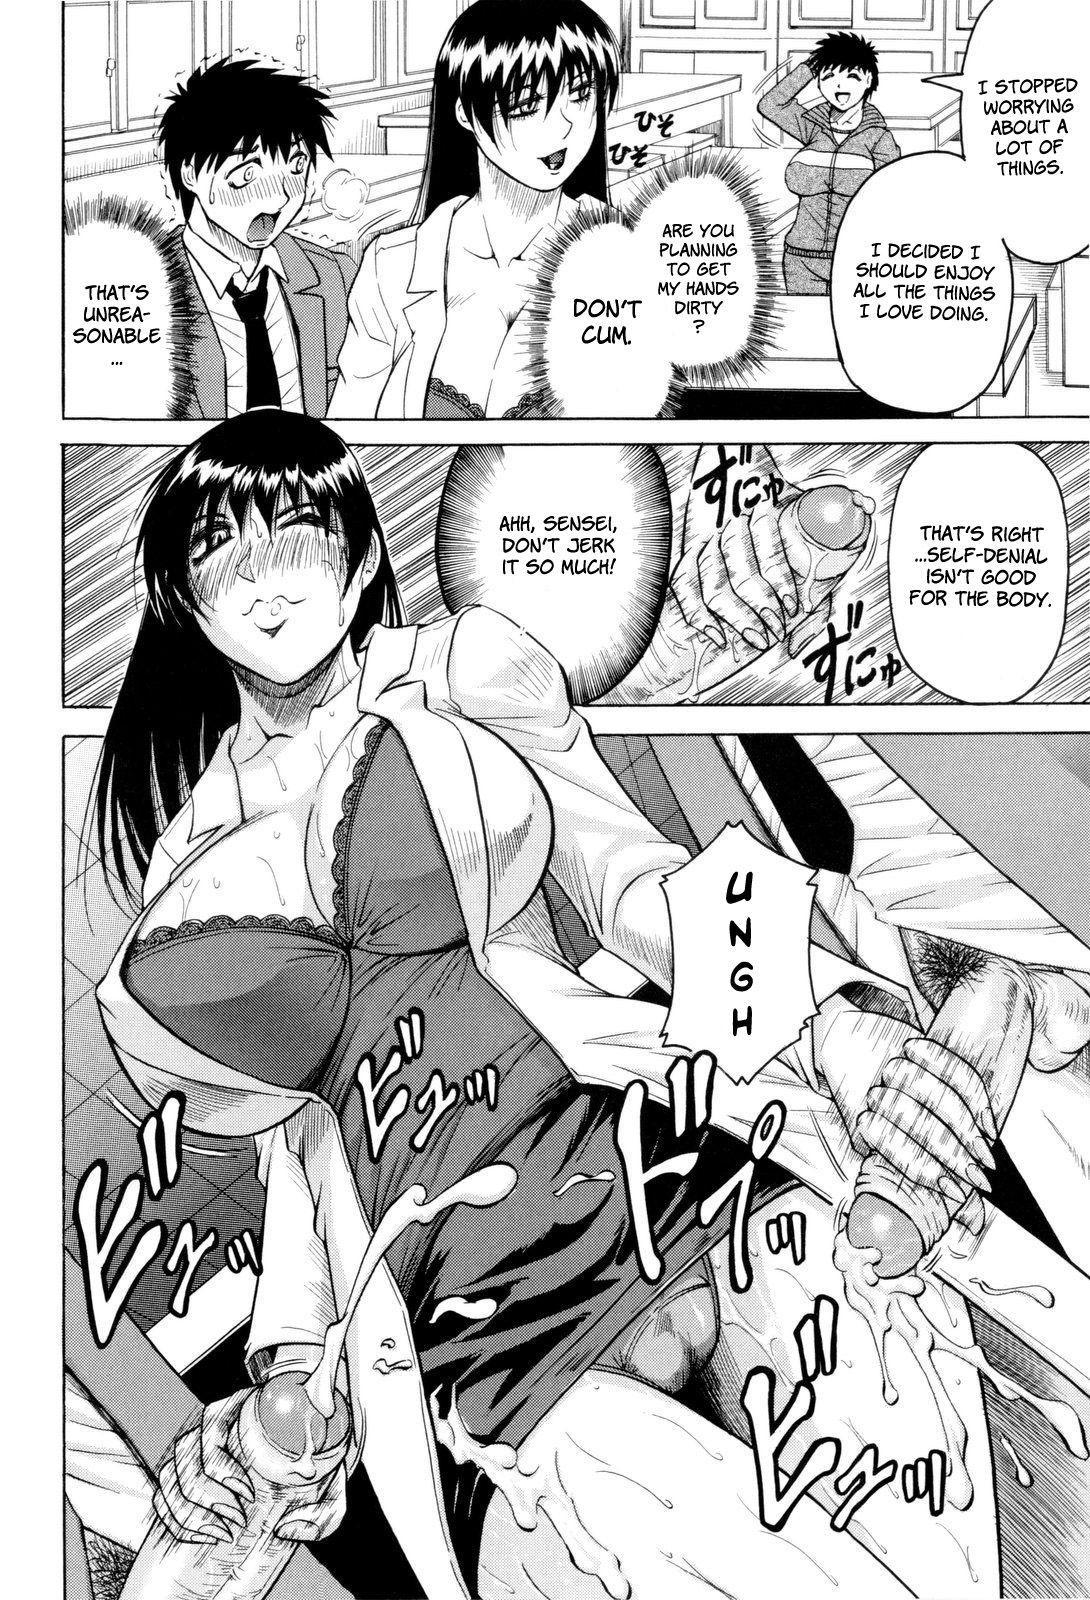 Sensei ni Dashitee! - It ejaculates in the teacher! 93